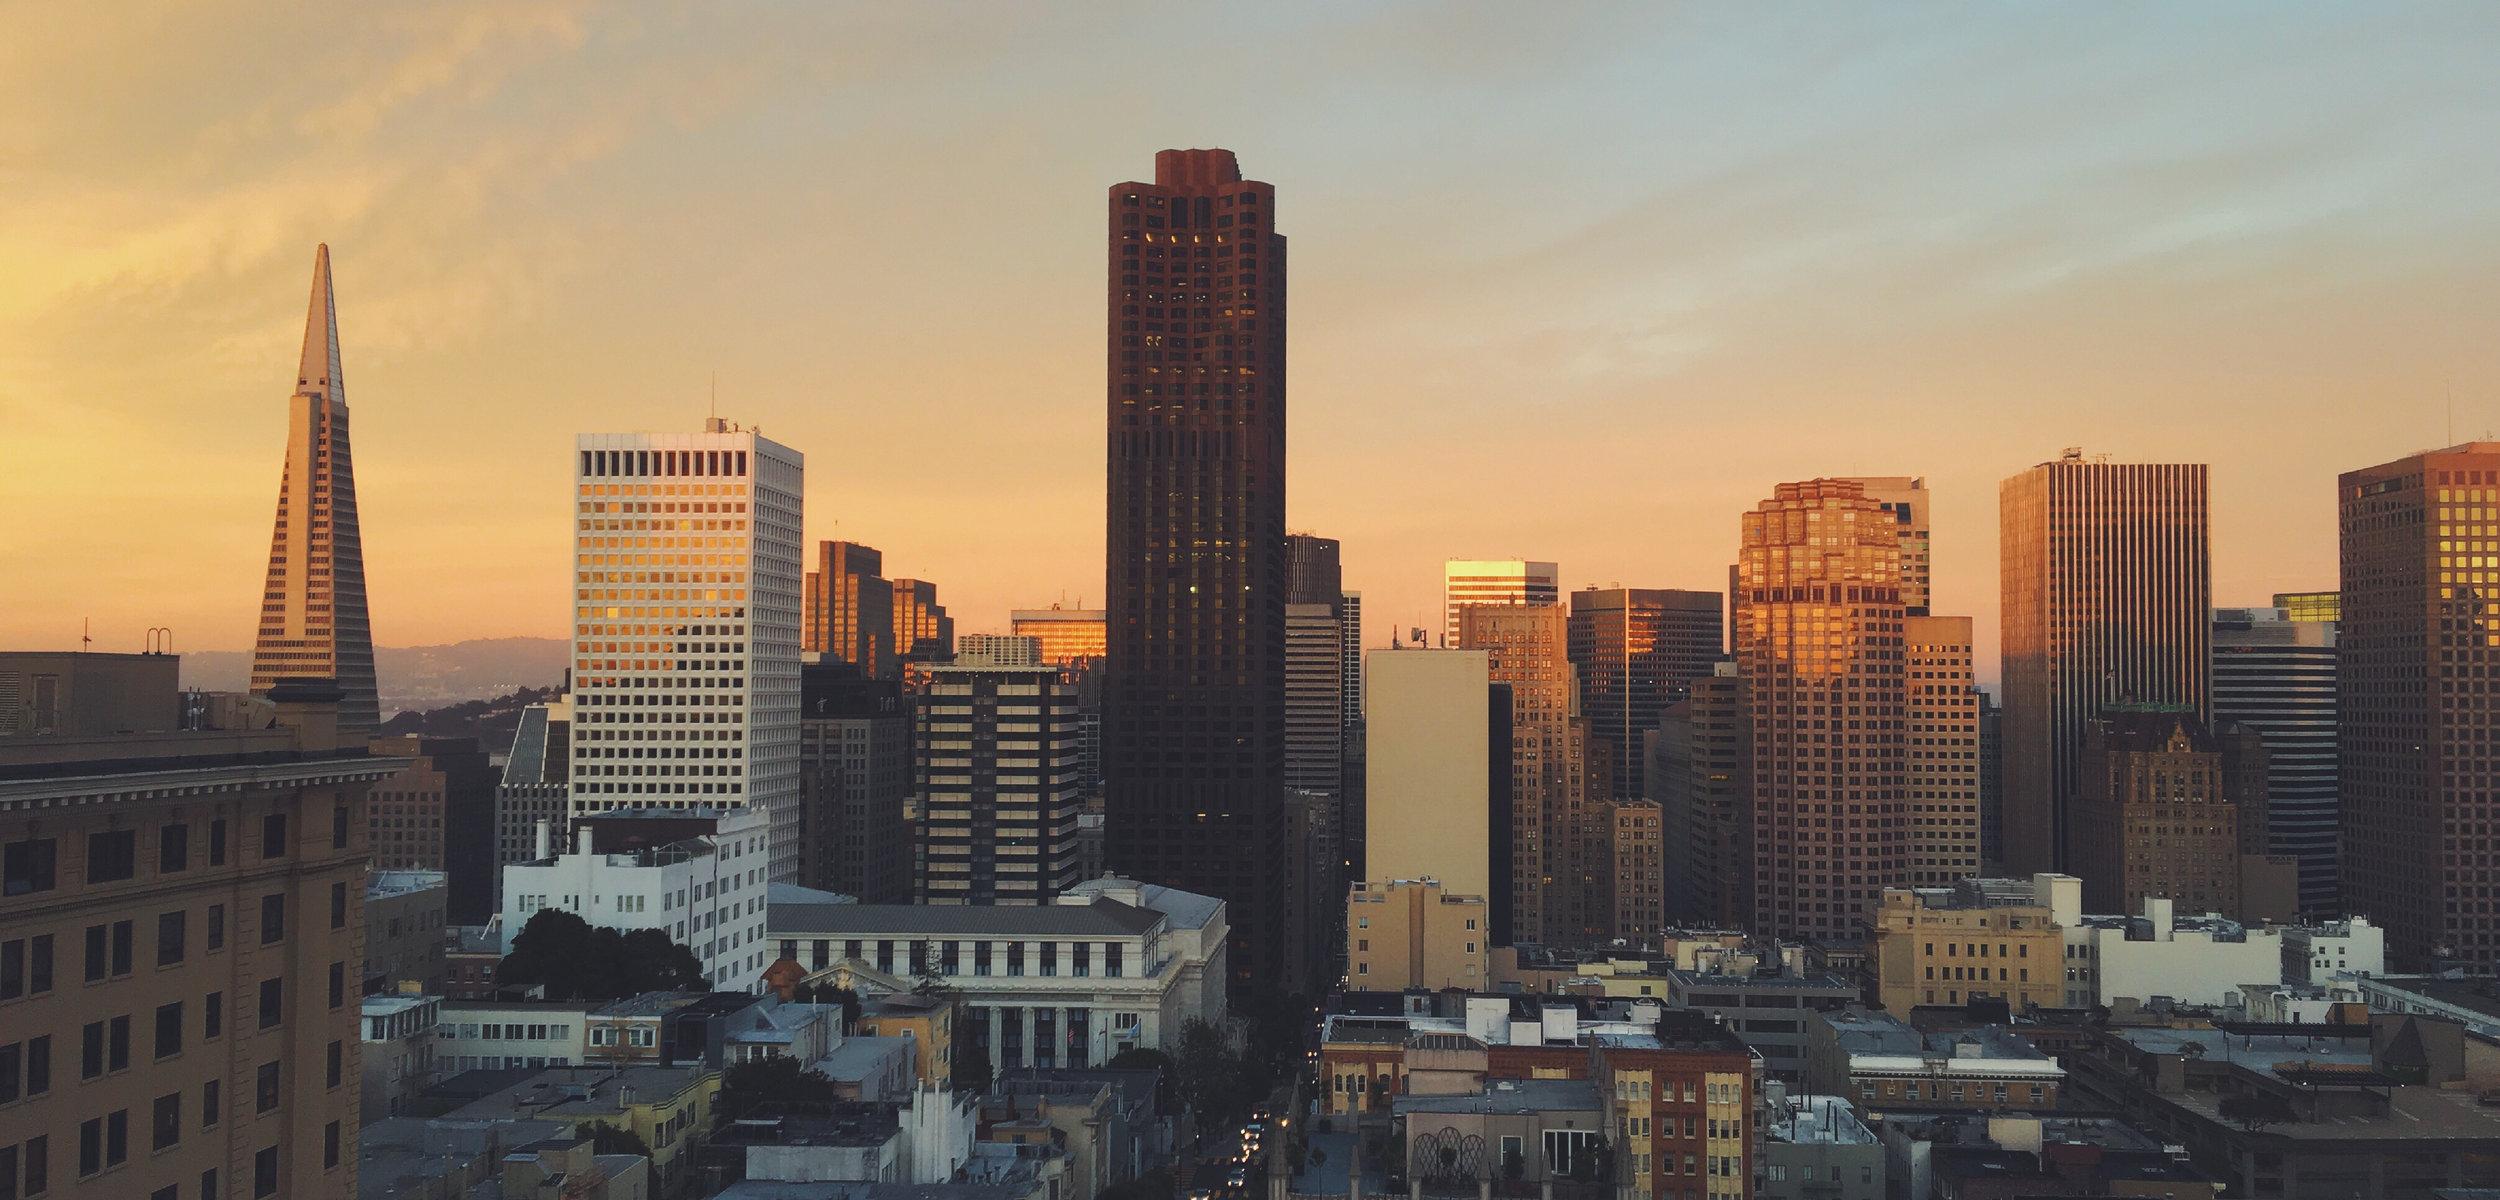 San Francisco skyline by  Jared Erondu